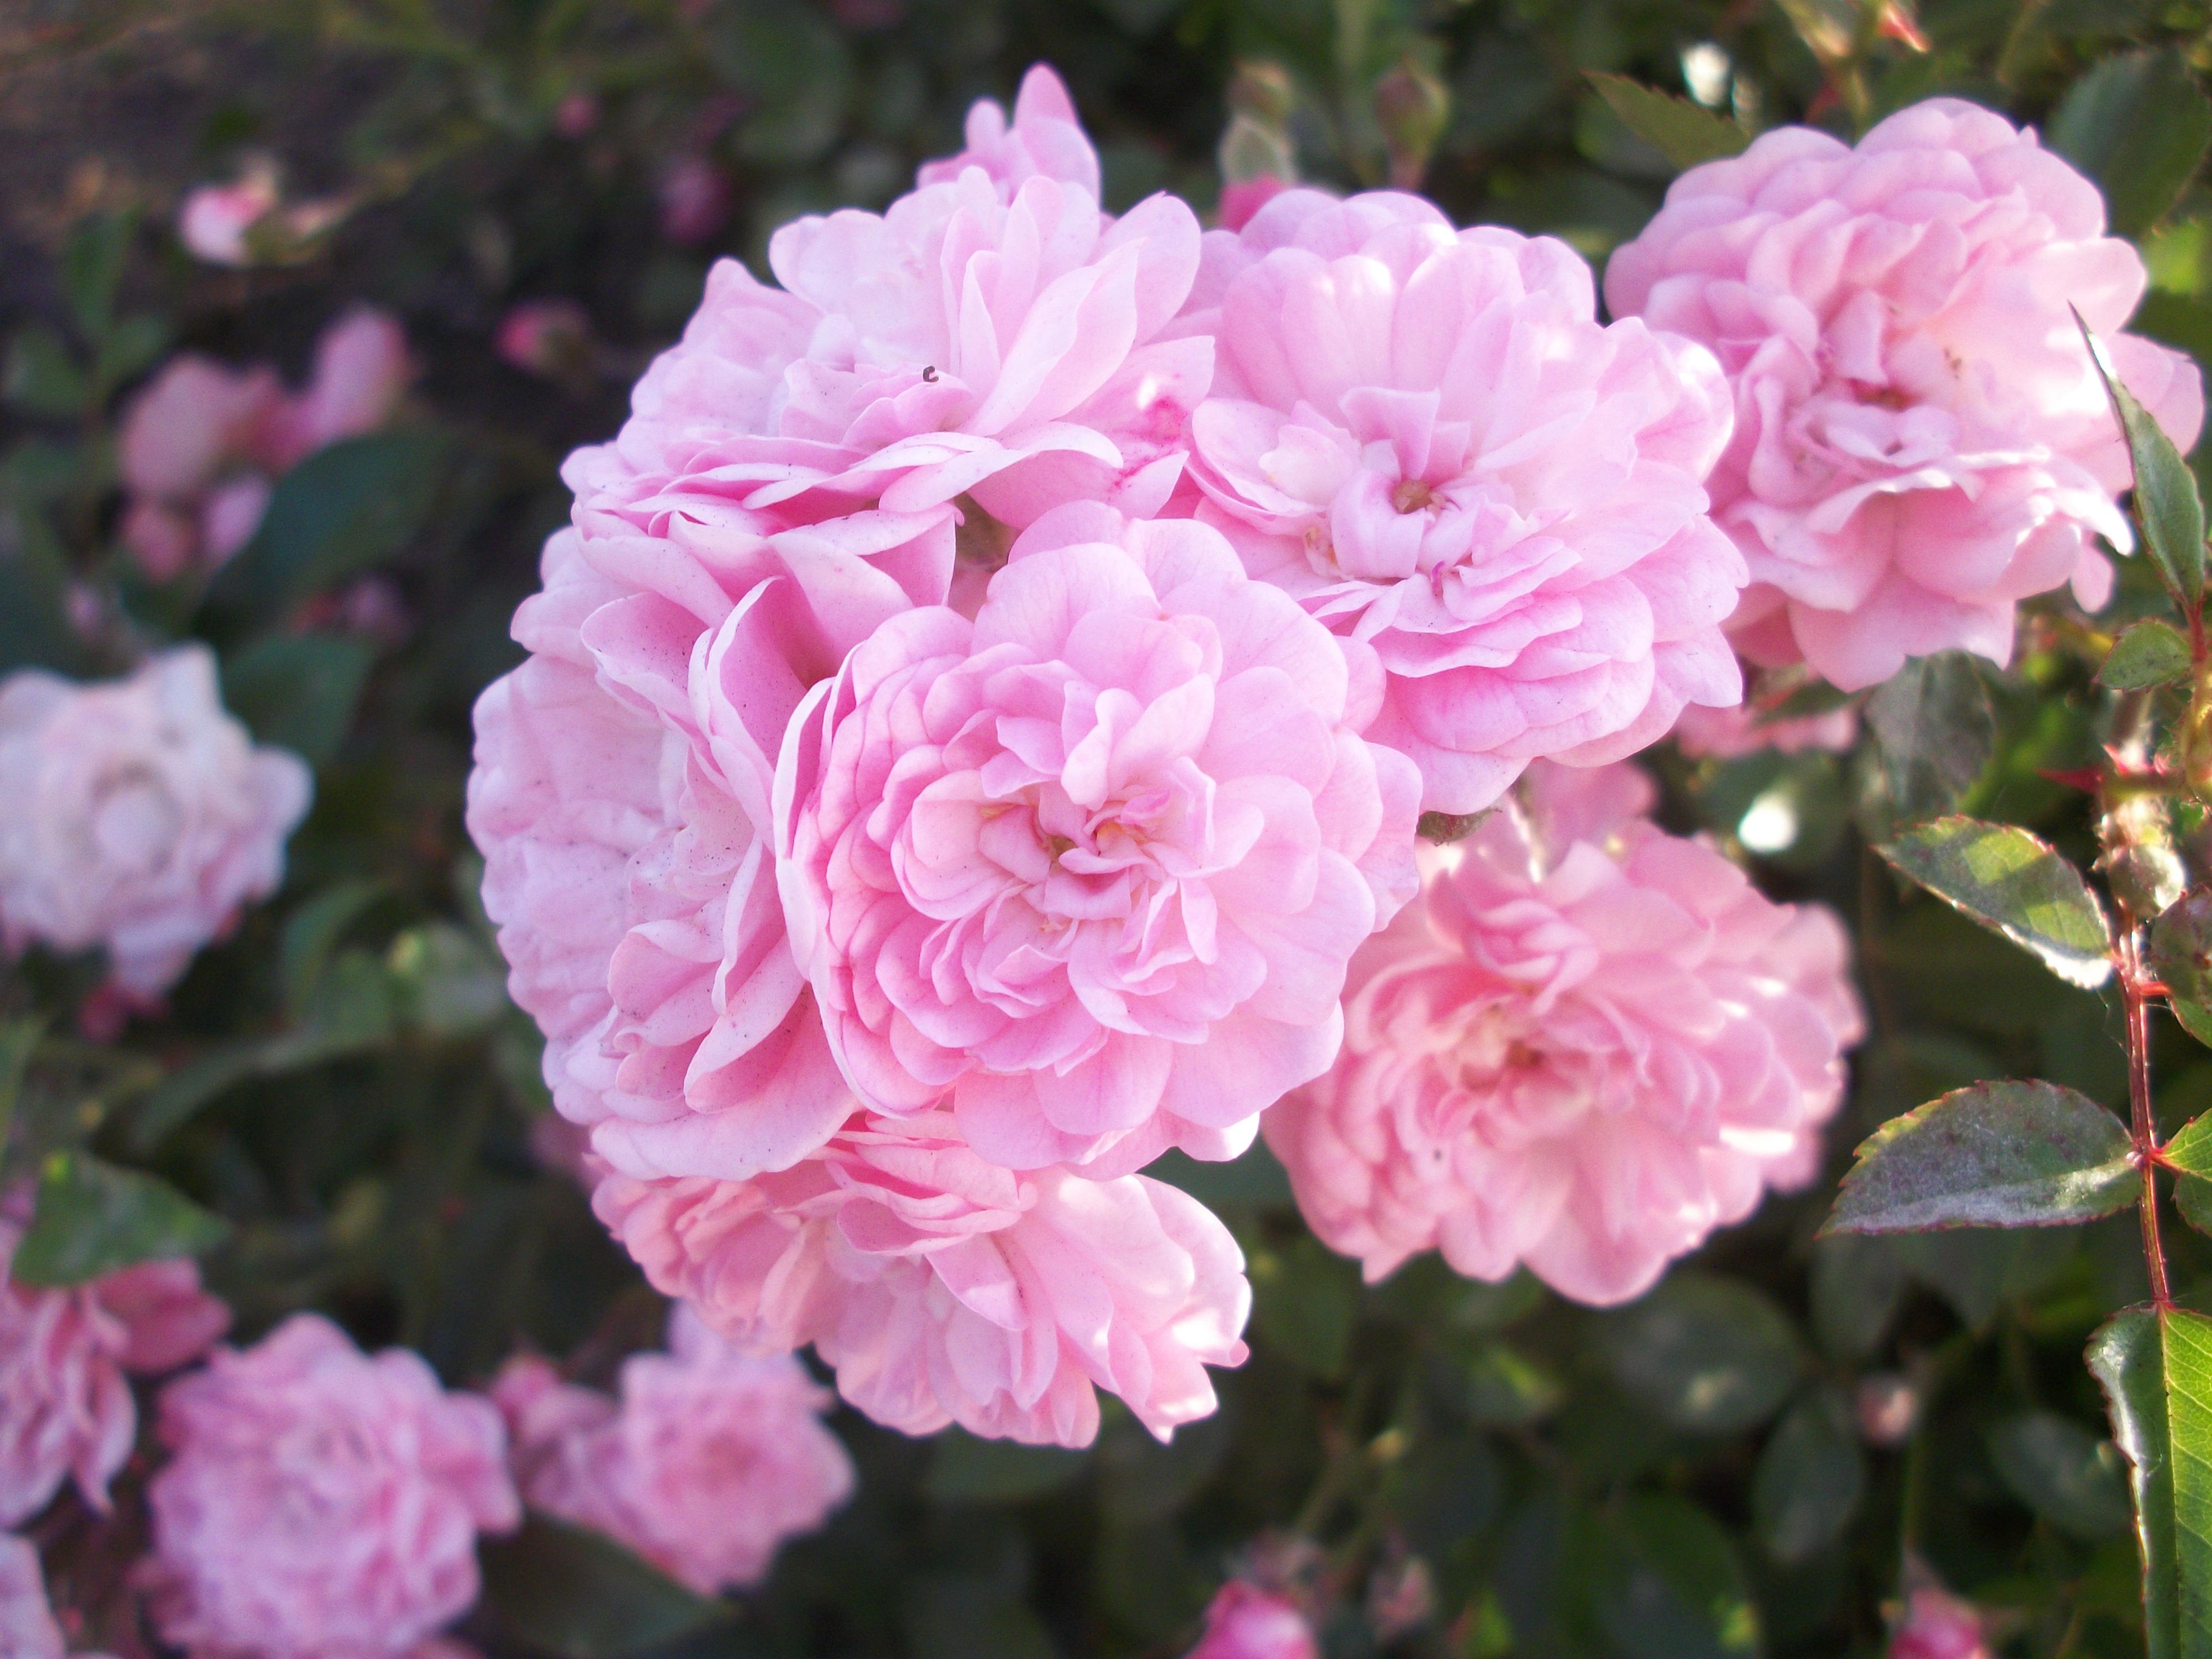 Free Images Beautiful Flowers Nature Bud Park Bush Flower